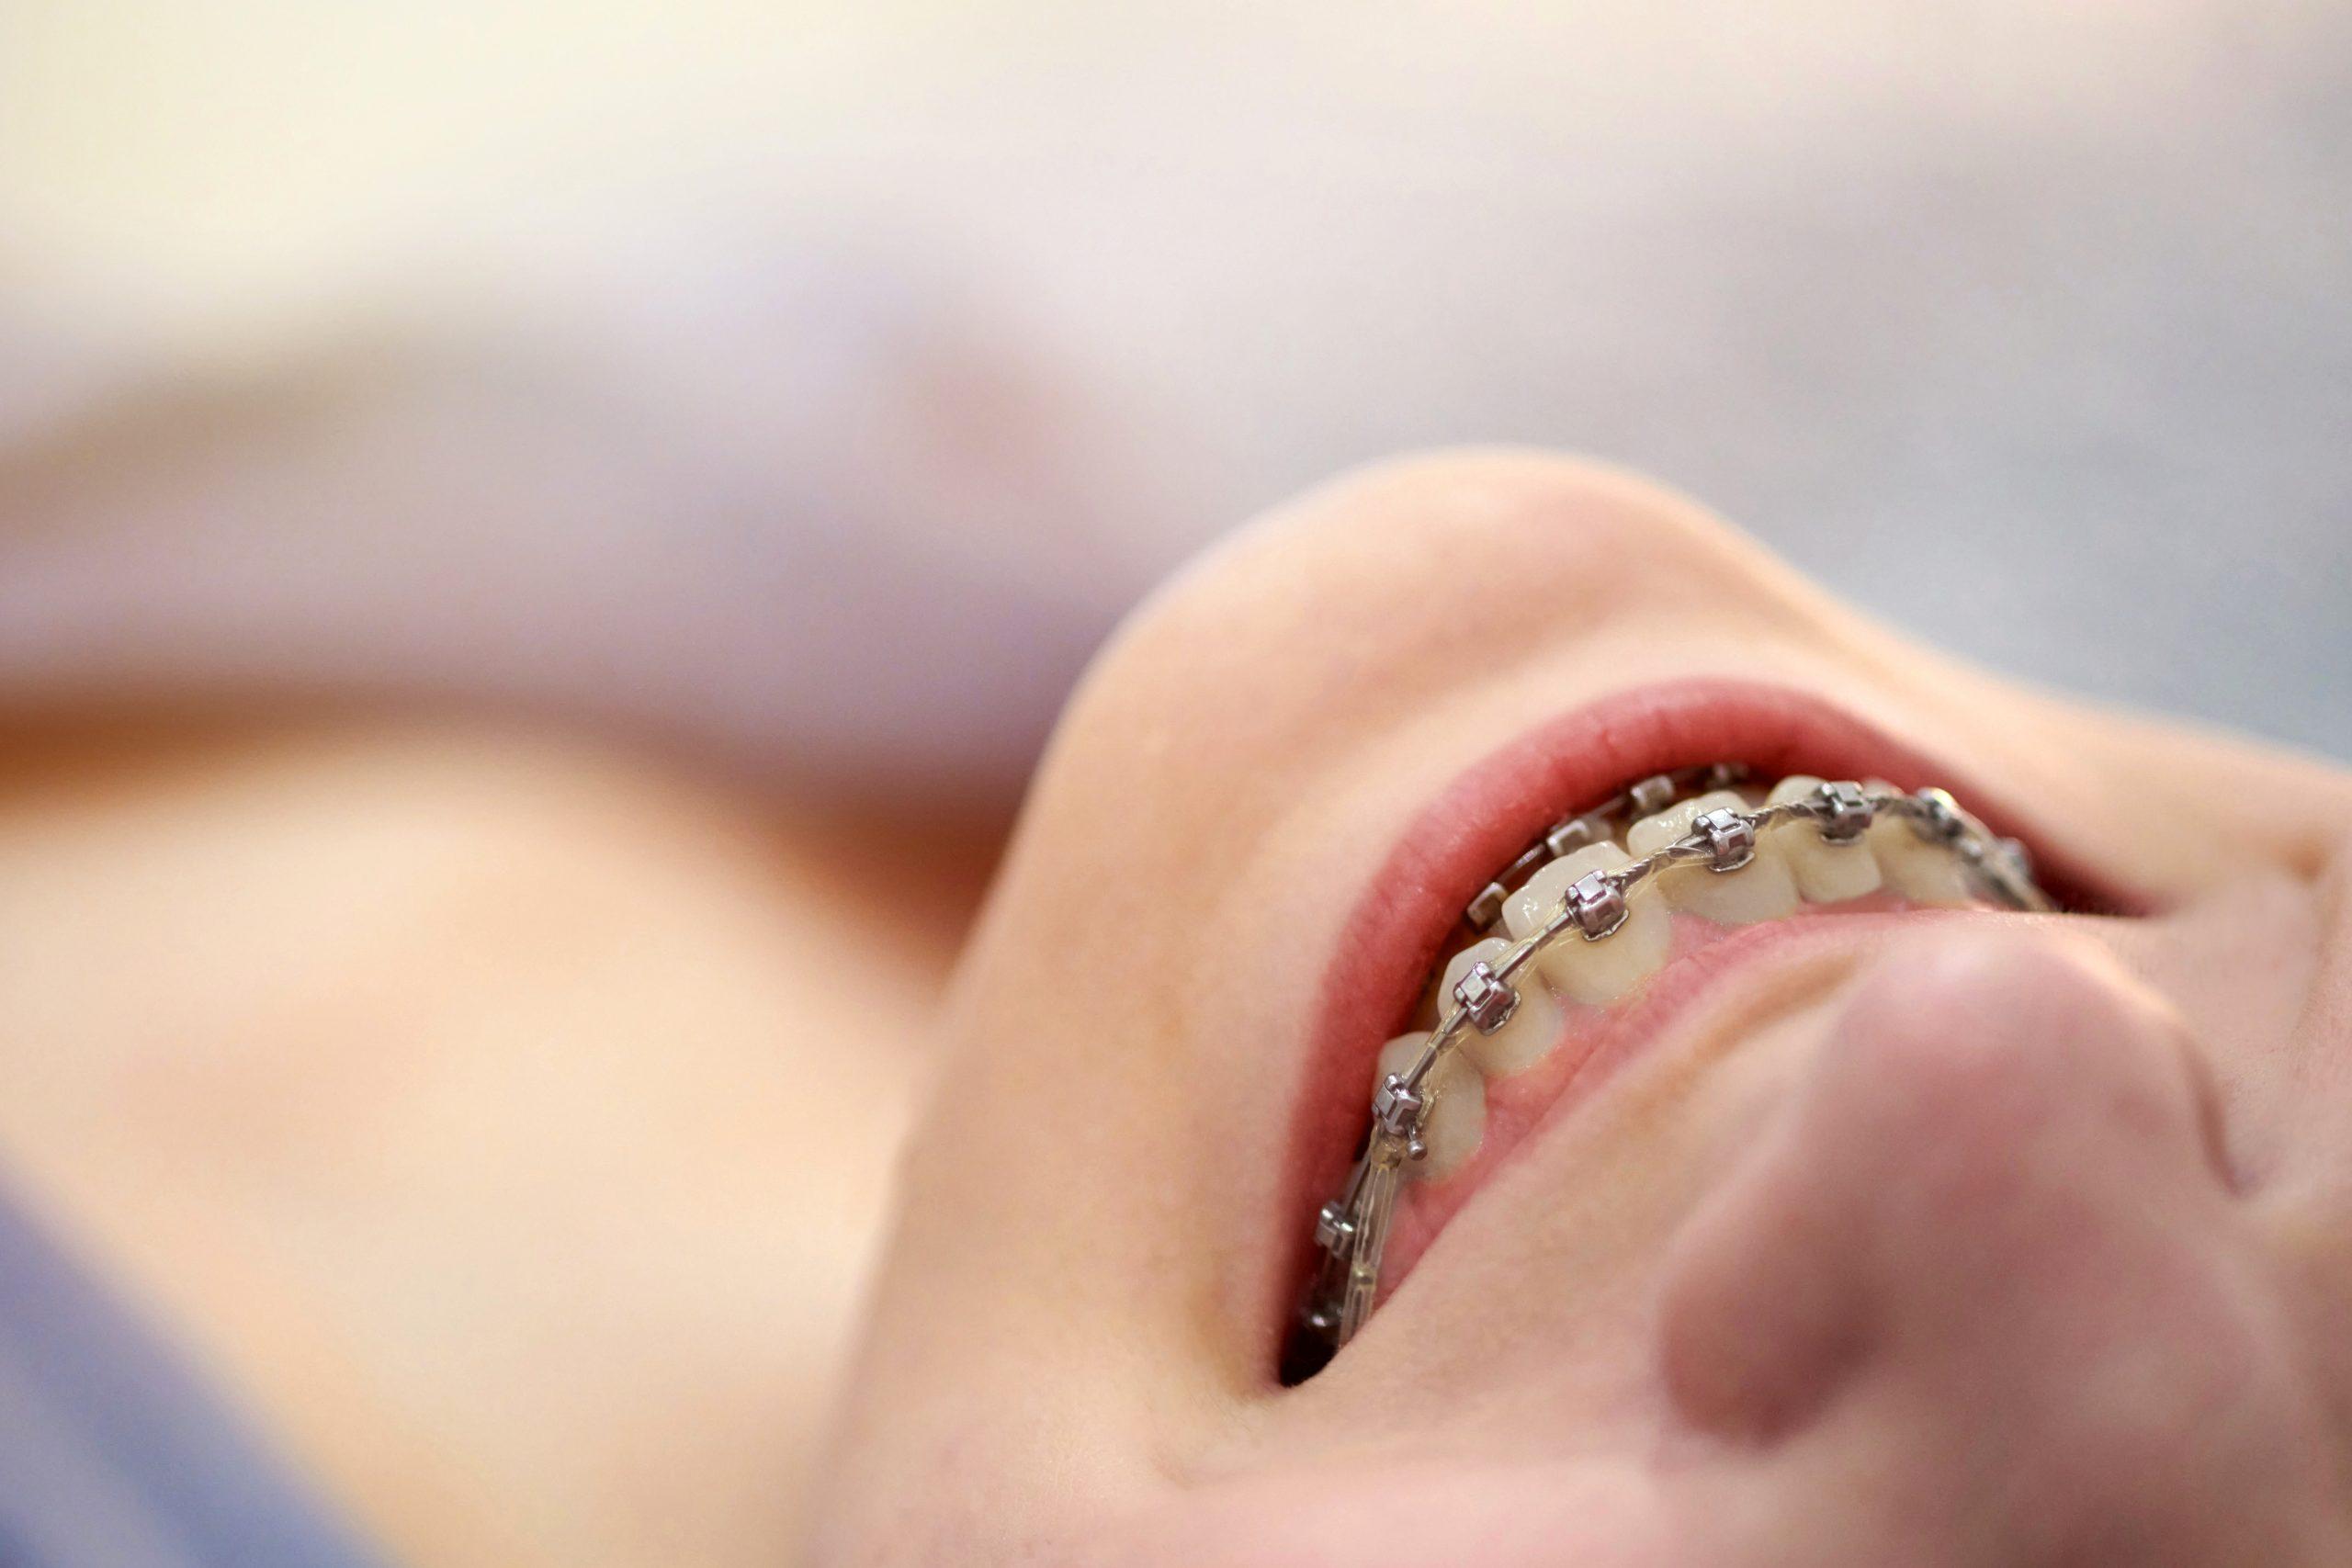 self ligating braces in Plano, Tx